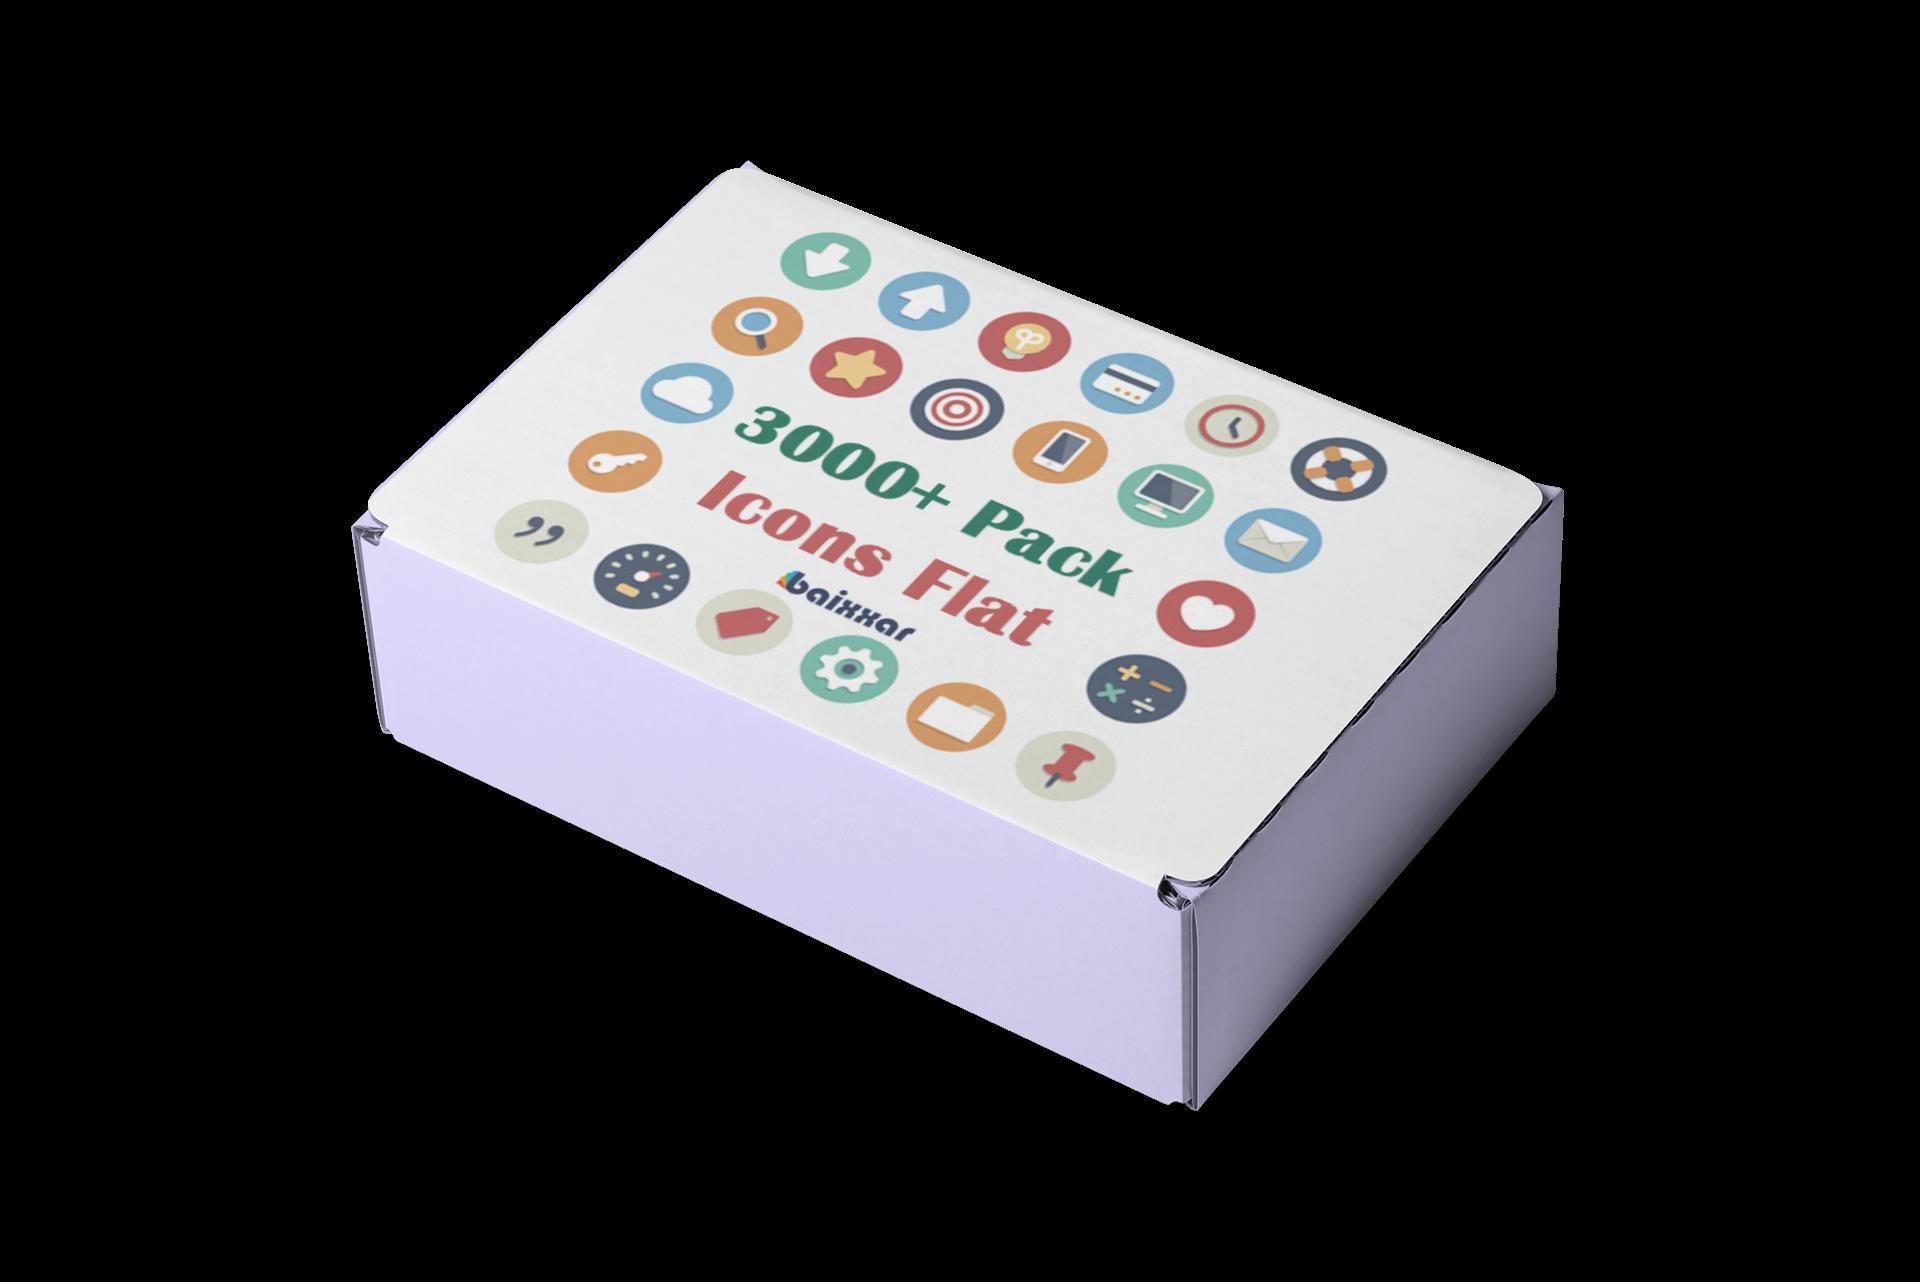 Pack 3000+ Icons Flat Editable Graphic Designer